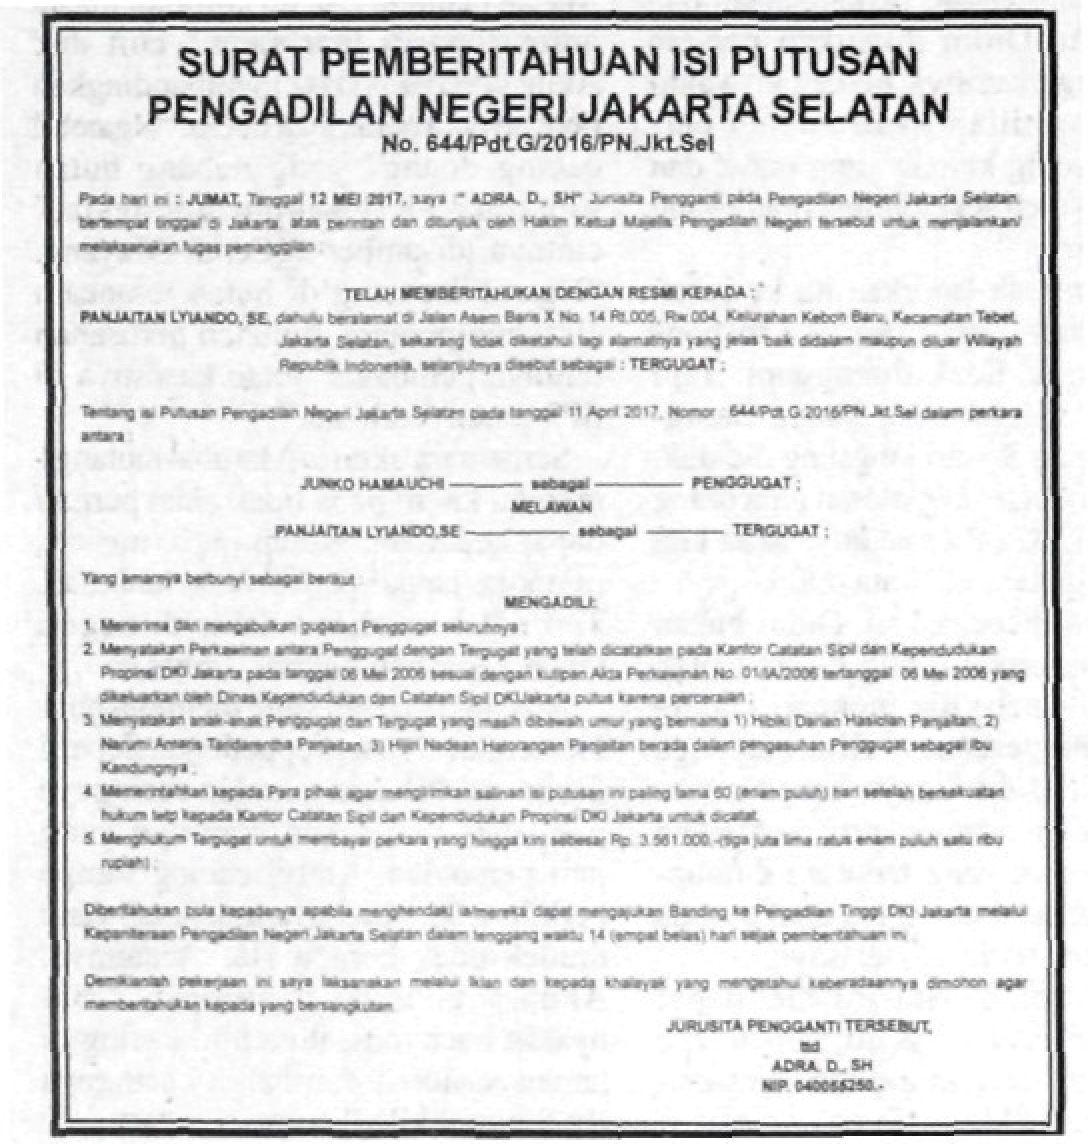 iklan pengumuman keputusan persidangan 2